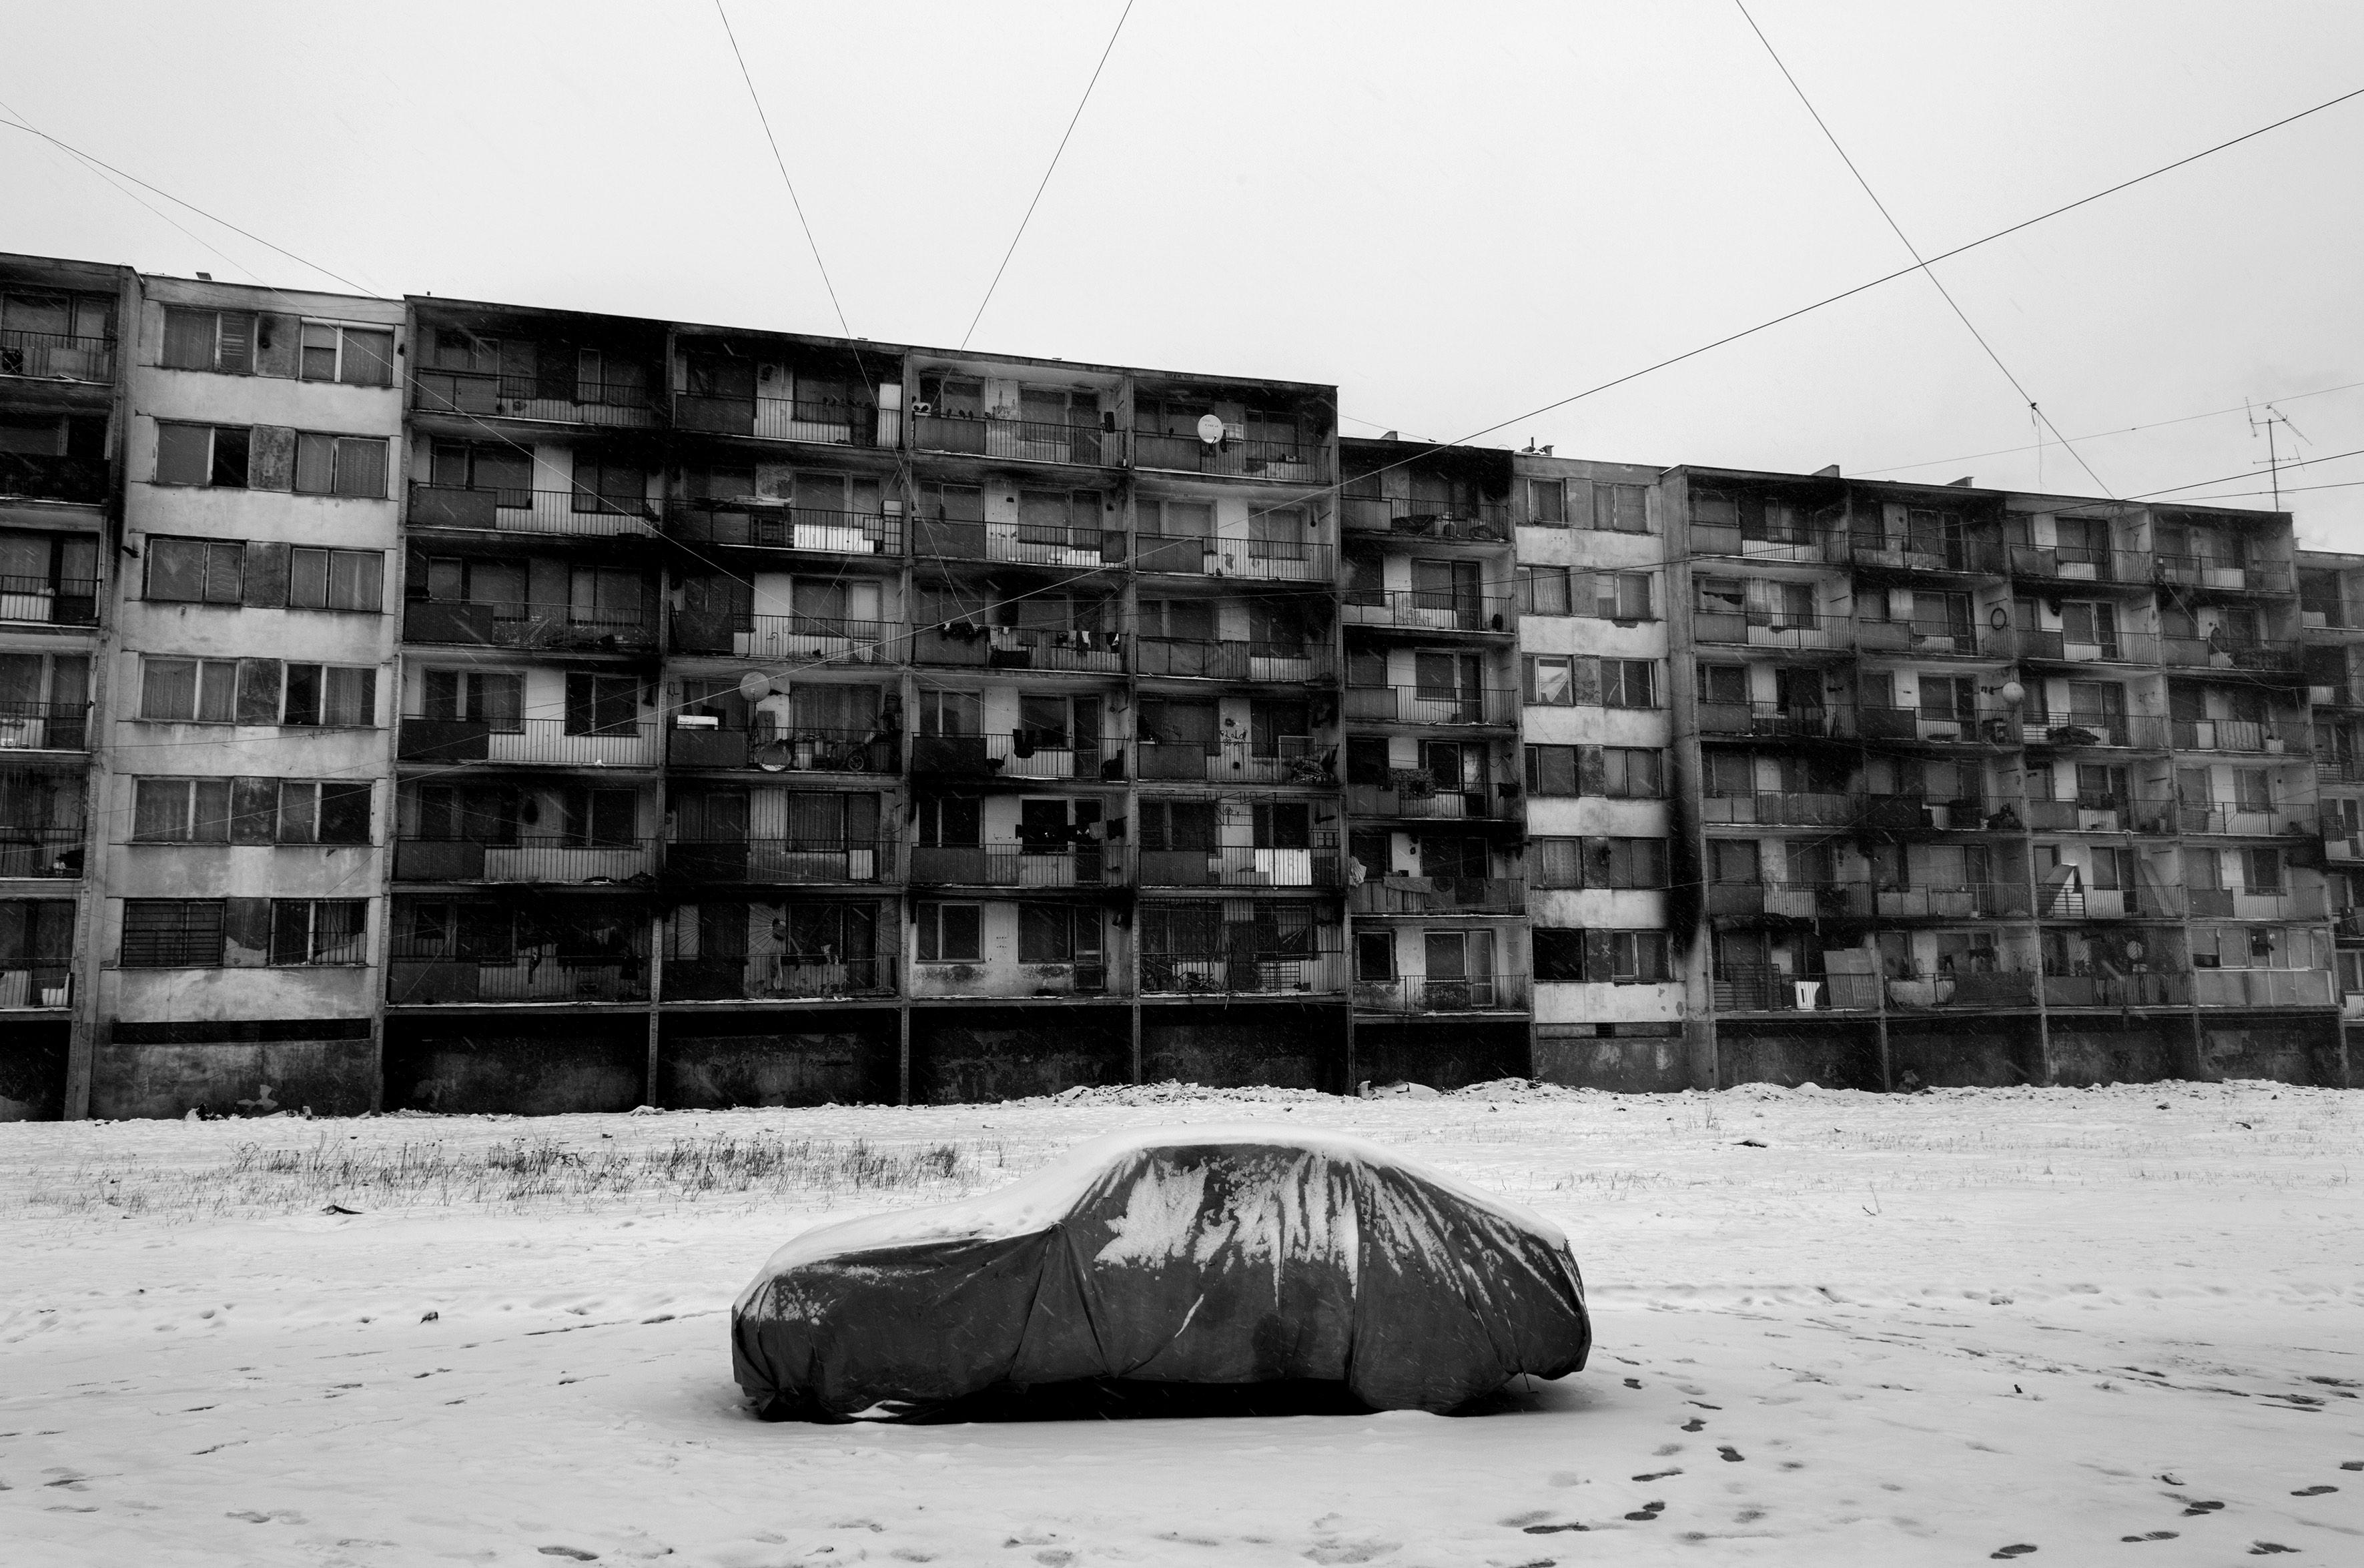 Košice, Slovakia, 2014© Åke Ericson